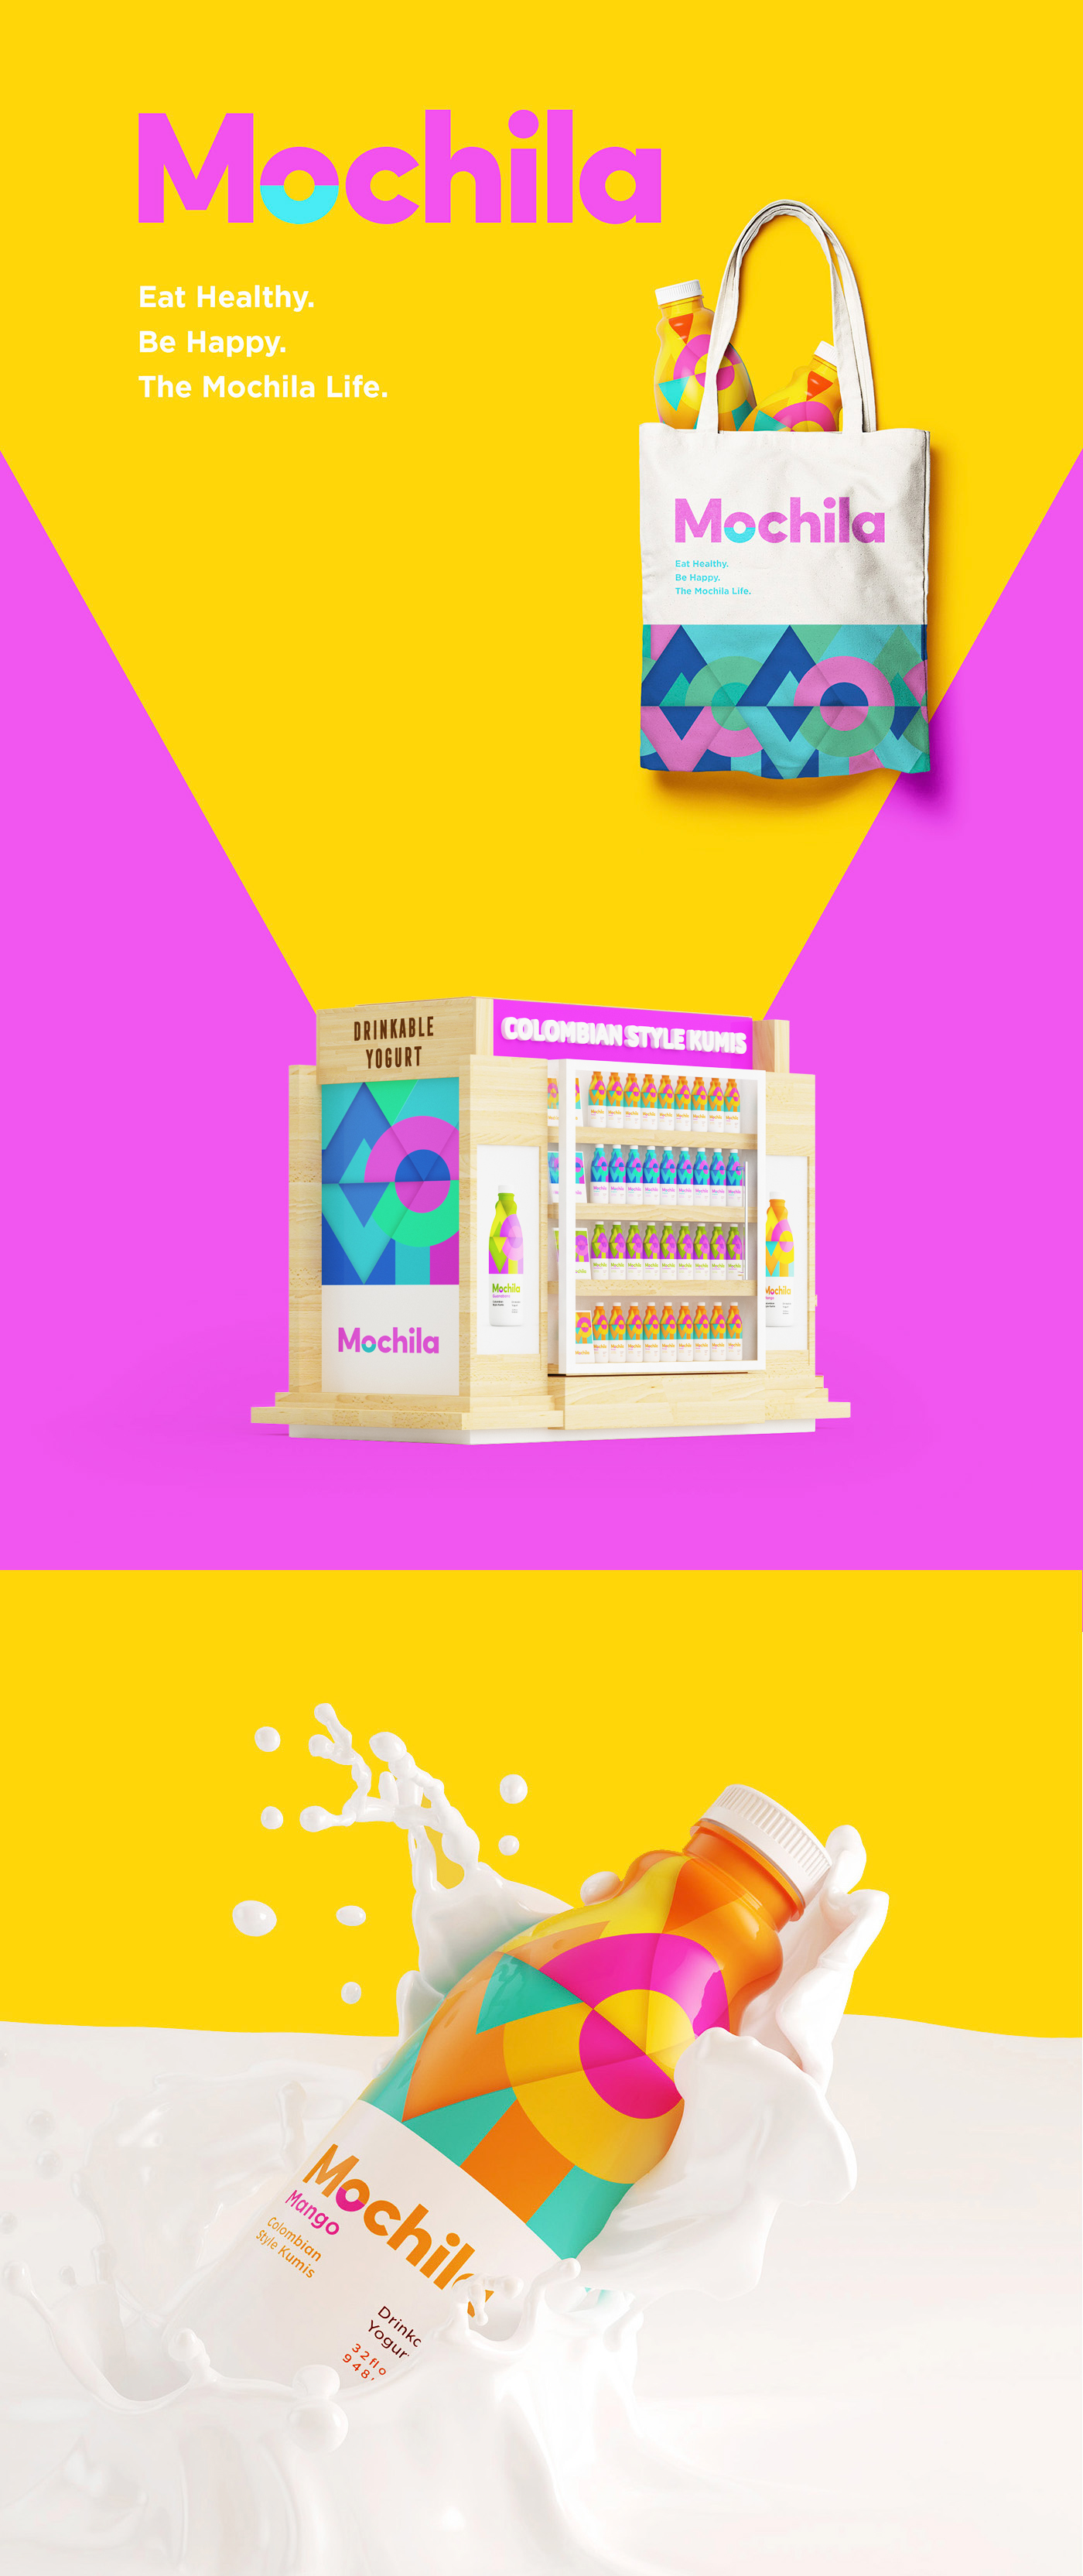 Kumis iogurt Colombian Latin happy bottle colorful